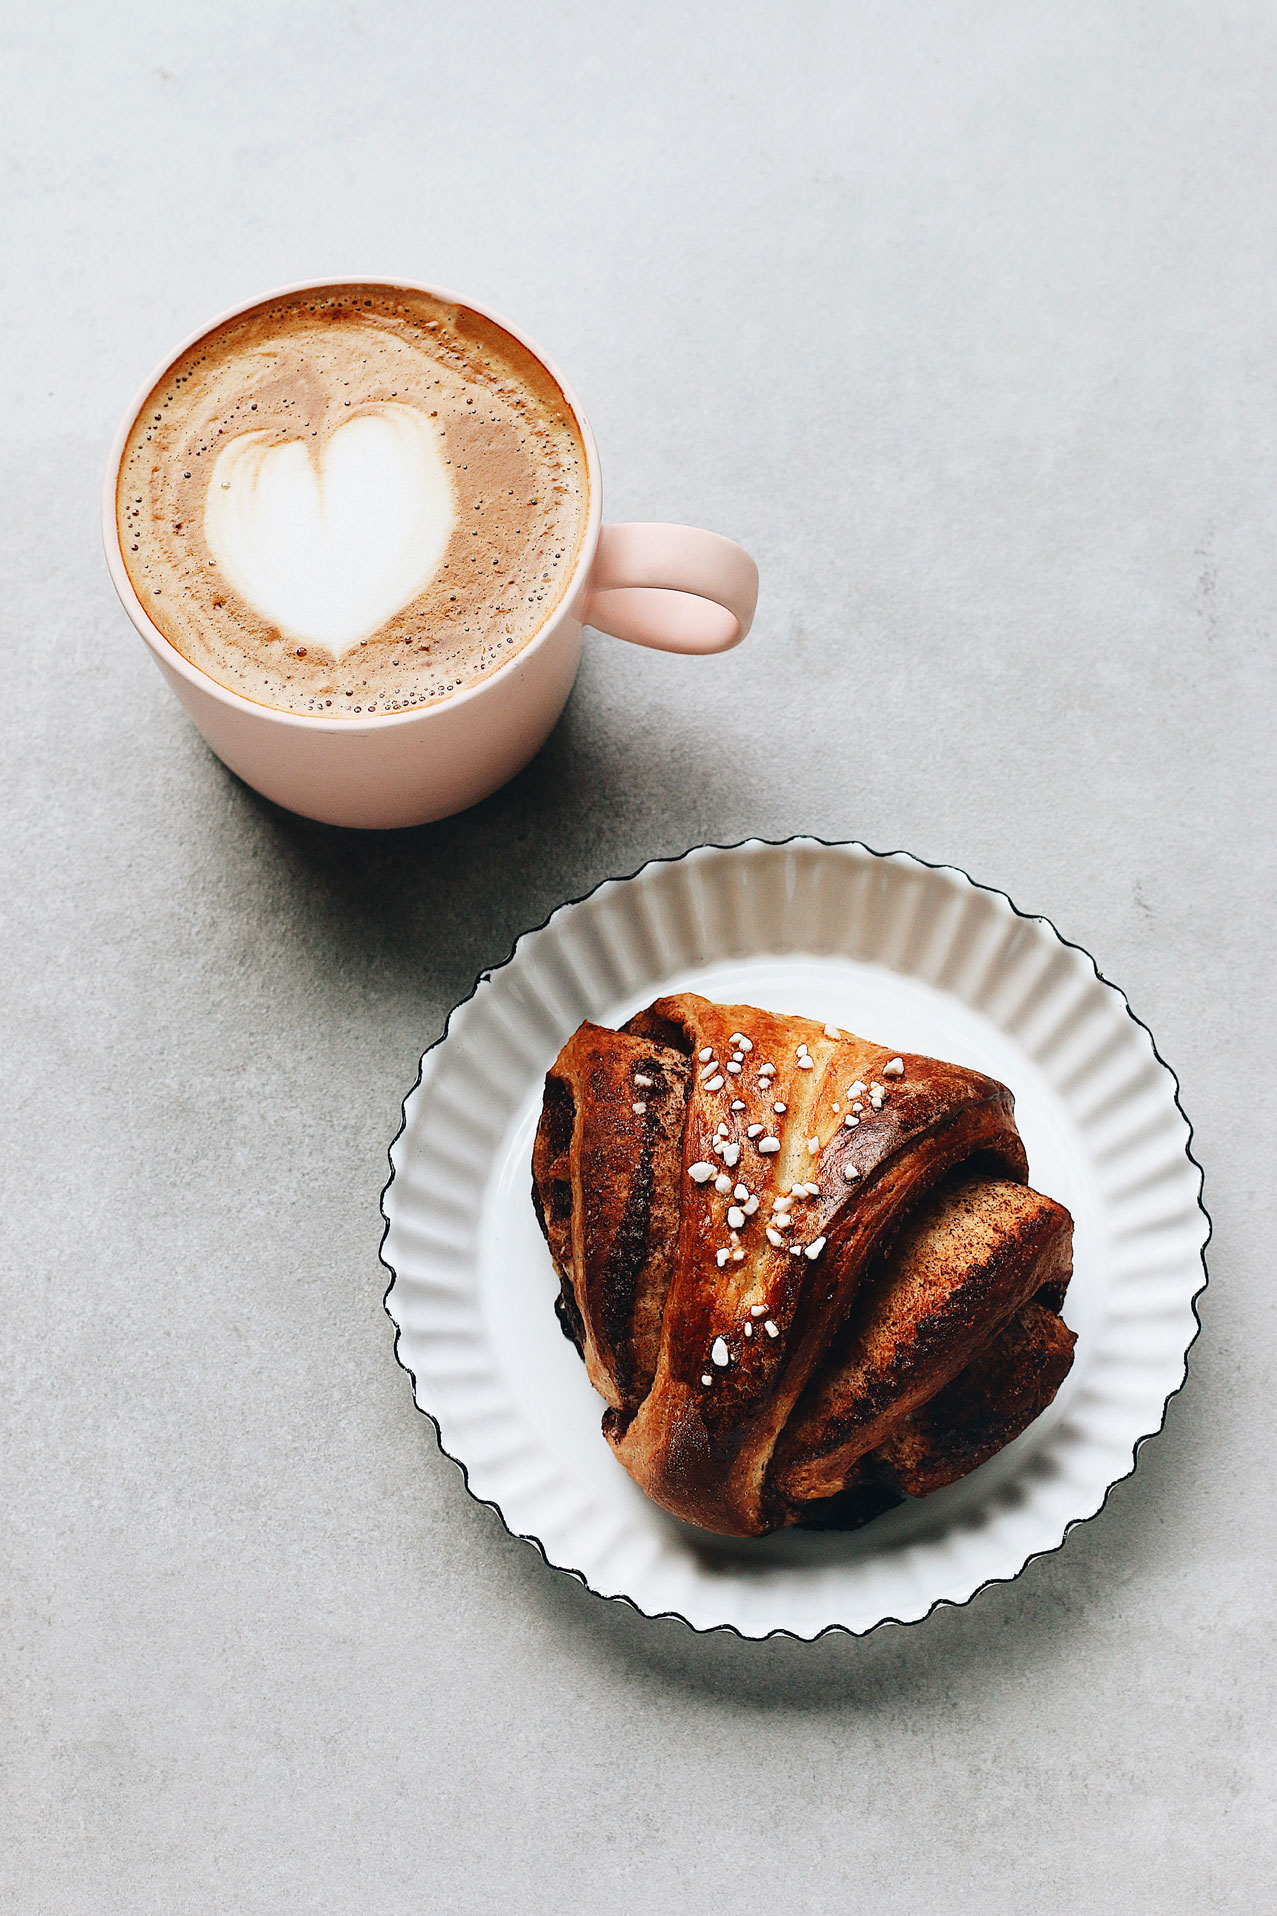 korvapuusti-finnish-cinnamon-cardamon-sweet-roll-with-coffee-latte